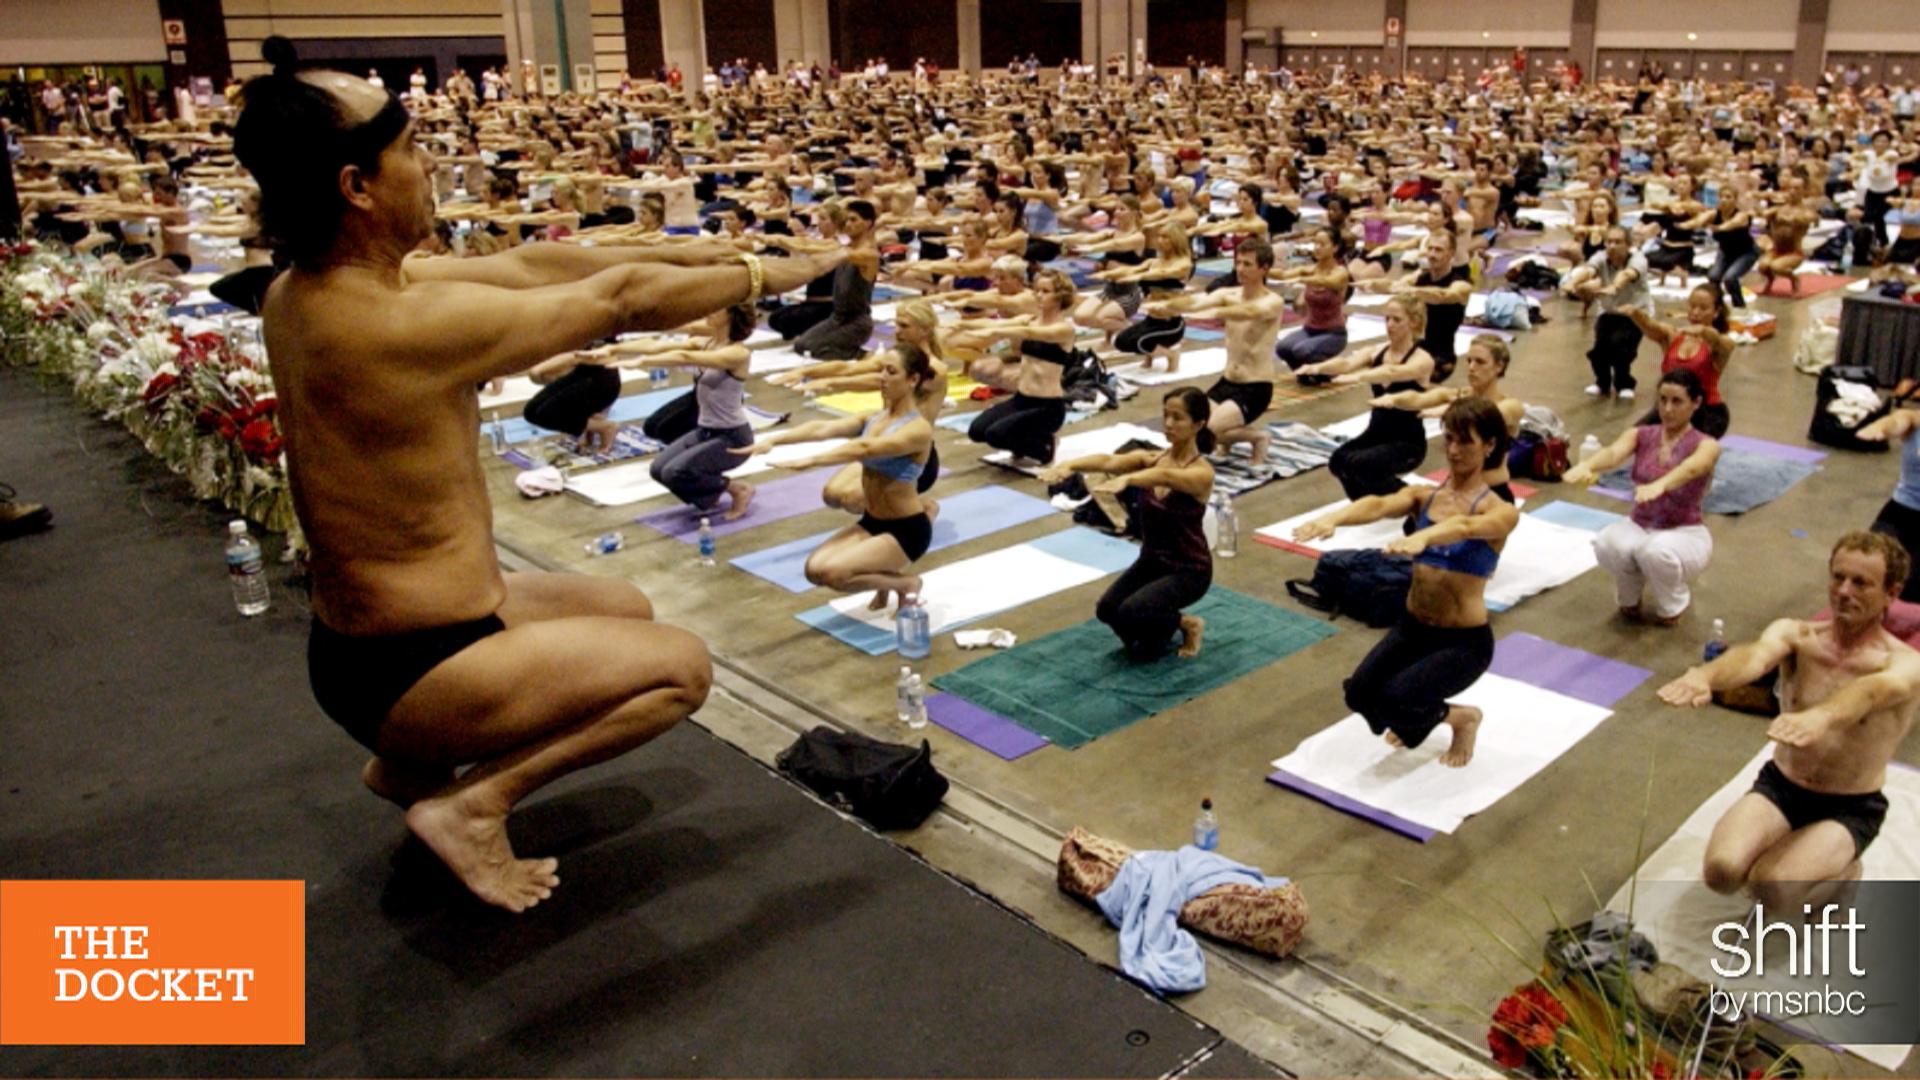 Hot Yoga guru in hot, hot water